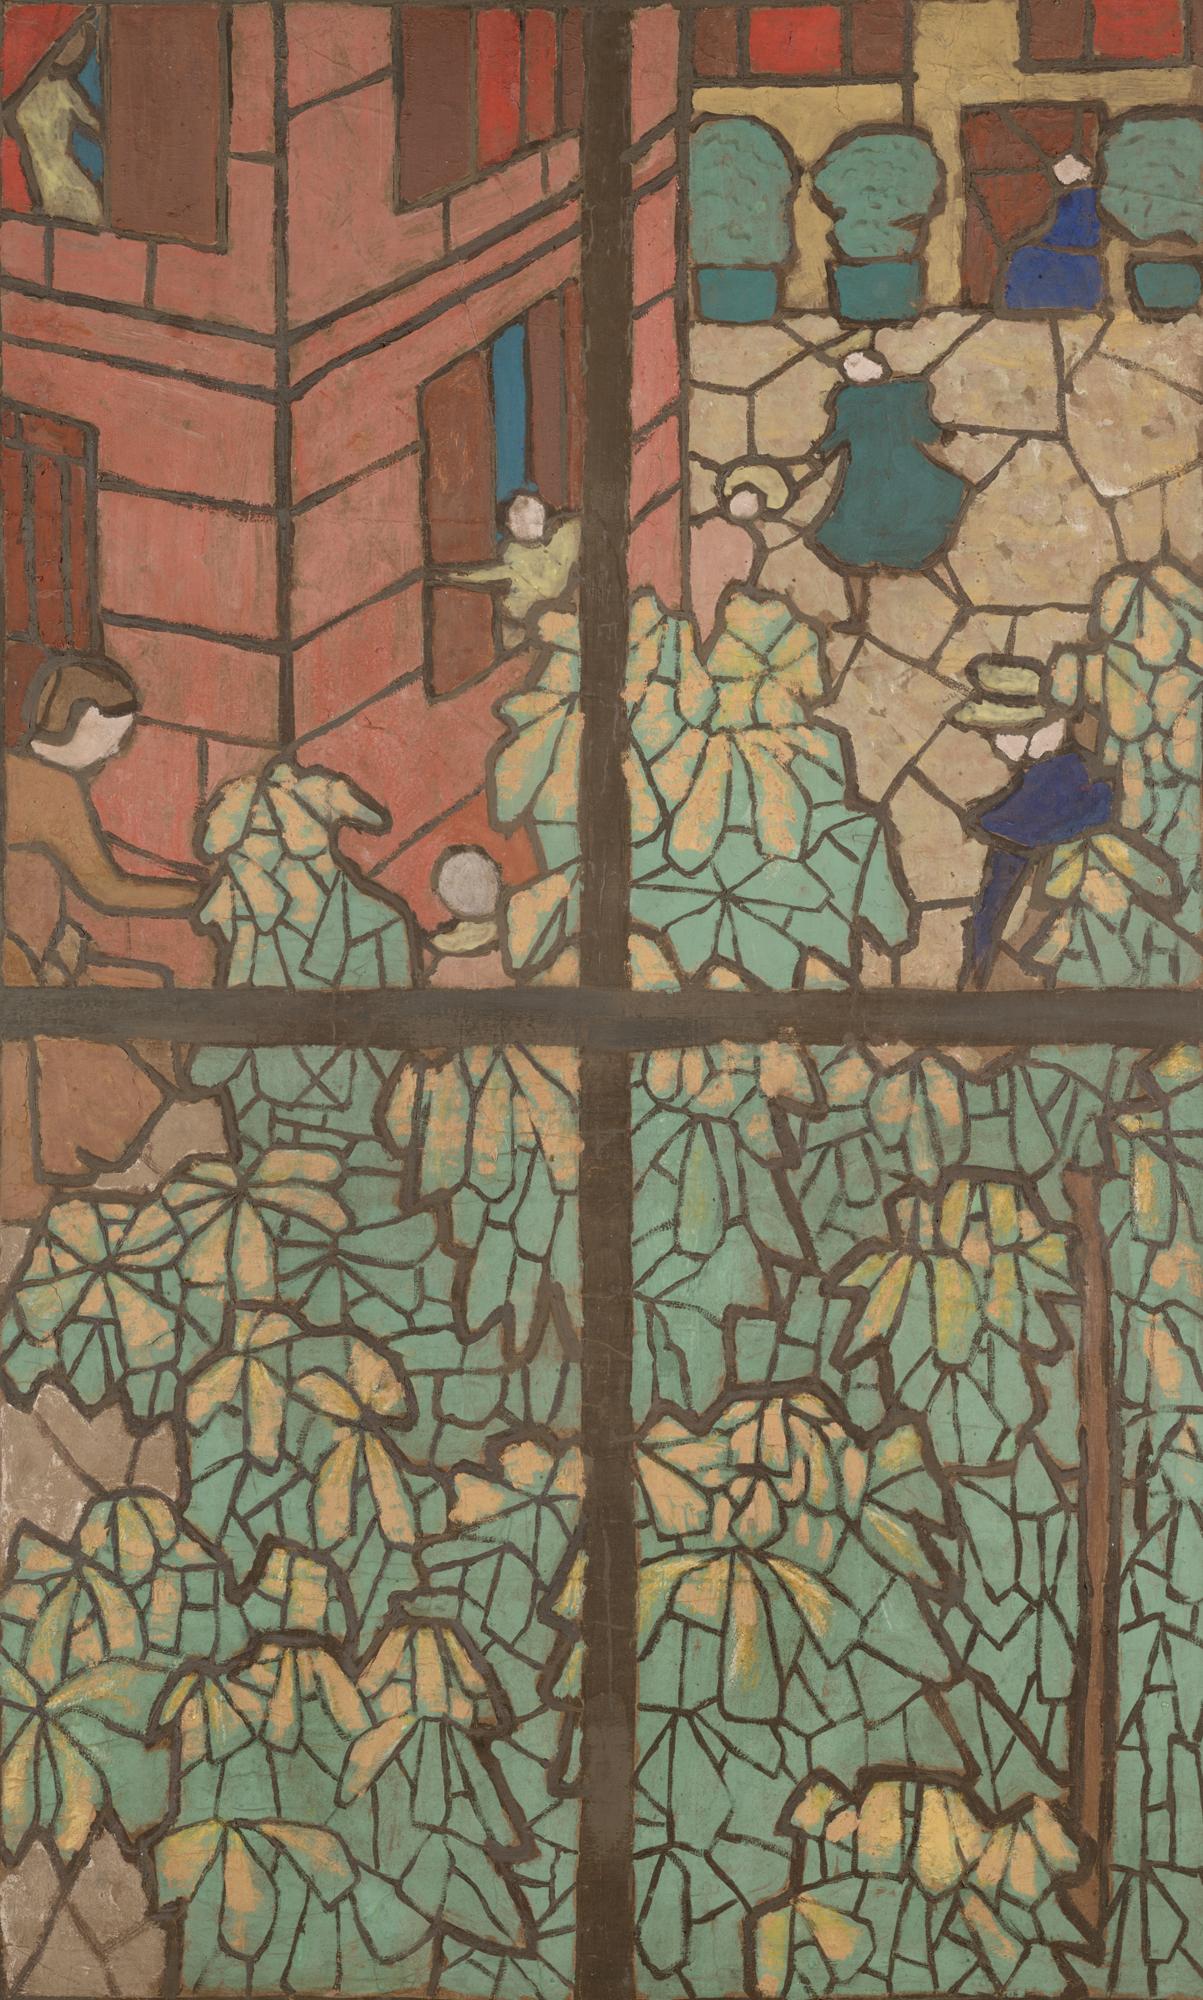 Édouard Vuillard, The Chestnut Trees, 1895, distemper on cardboard, 110 x 70 cm (Dallas Museum of Art) Design for Tiffany window